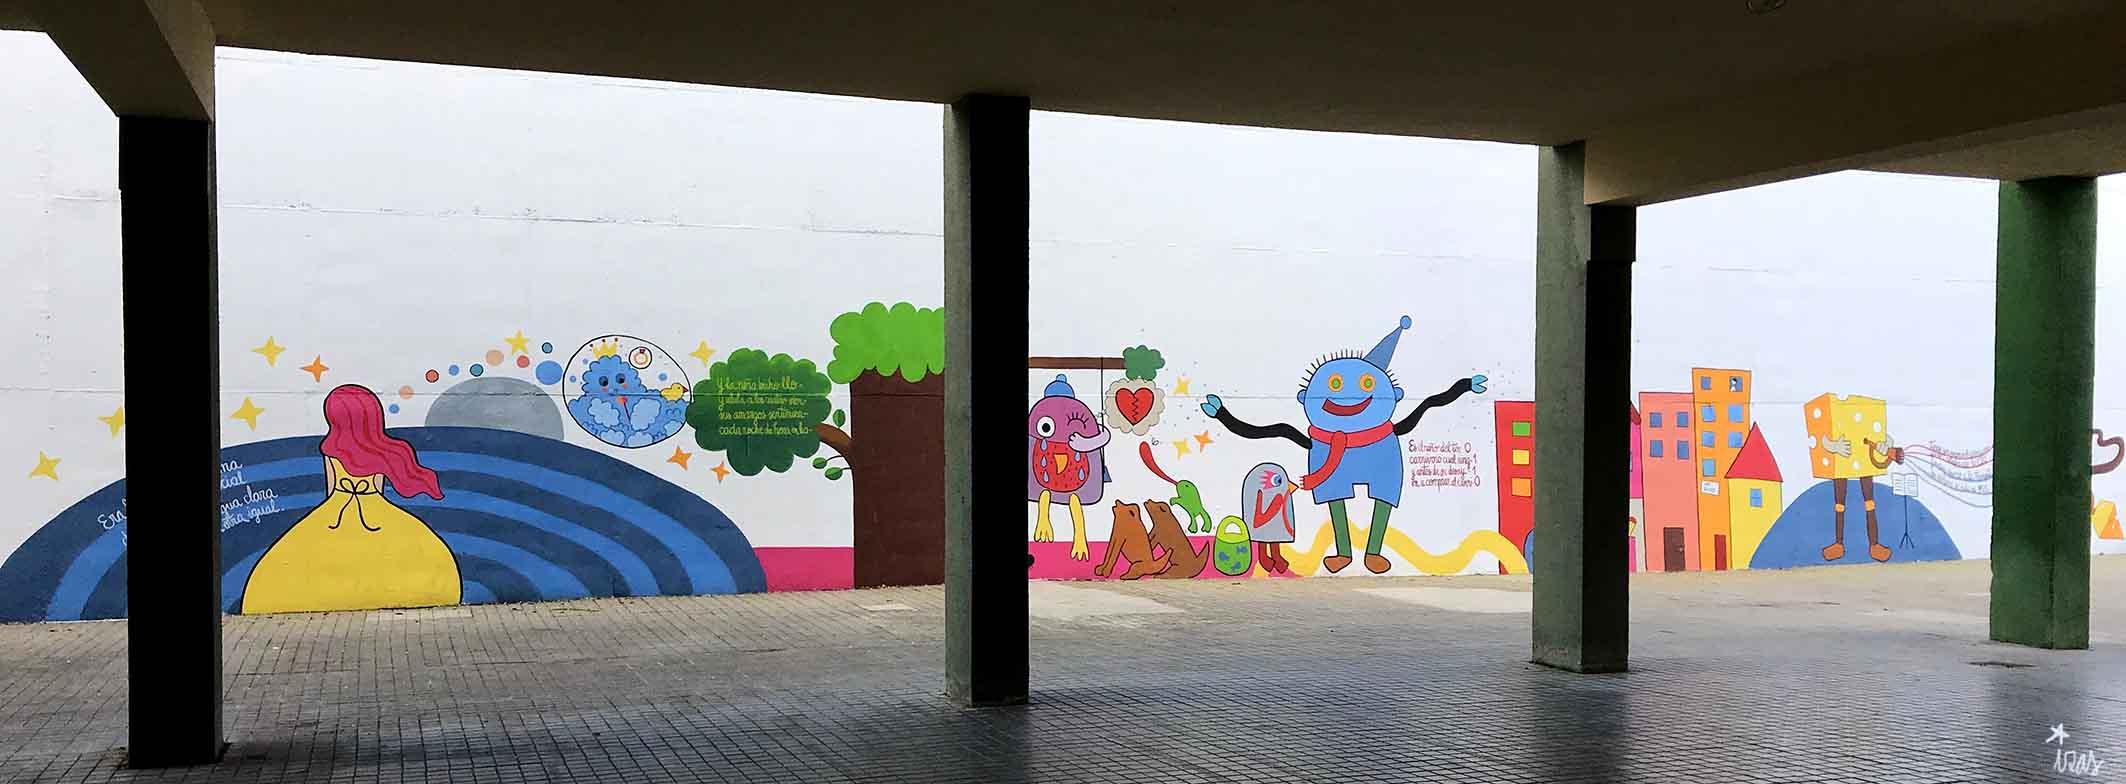 mural izas dibujando la palabra béjar 3